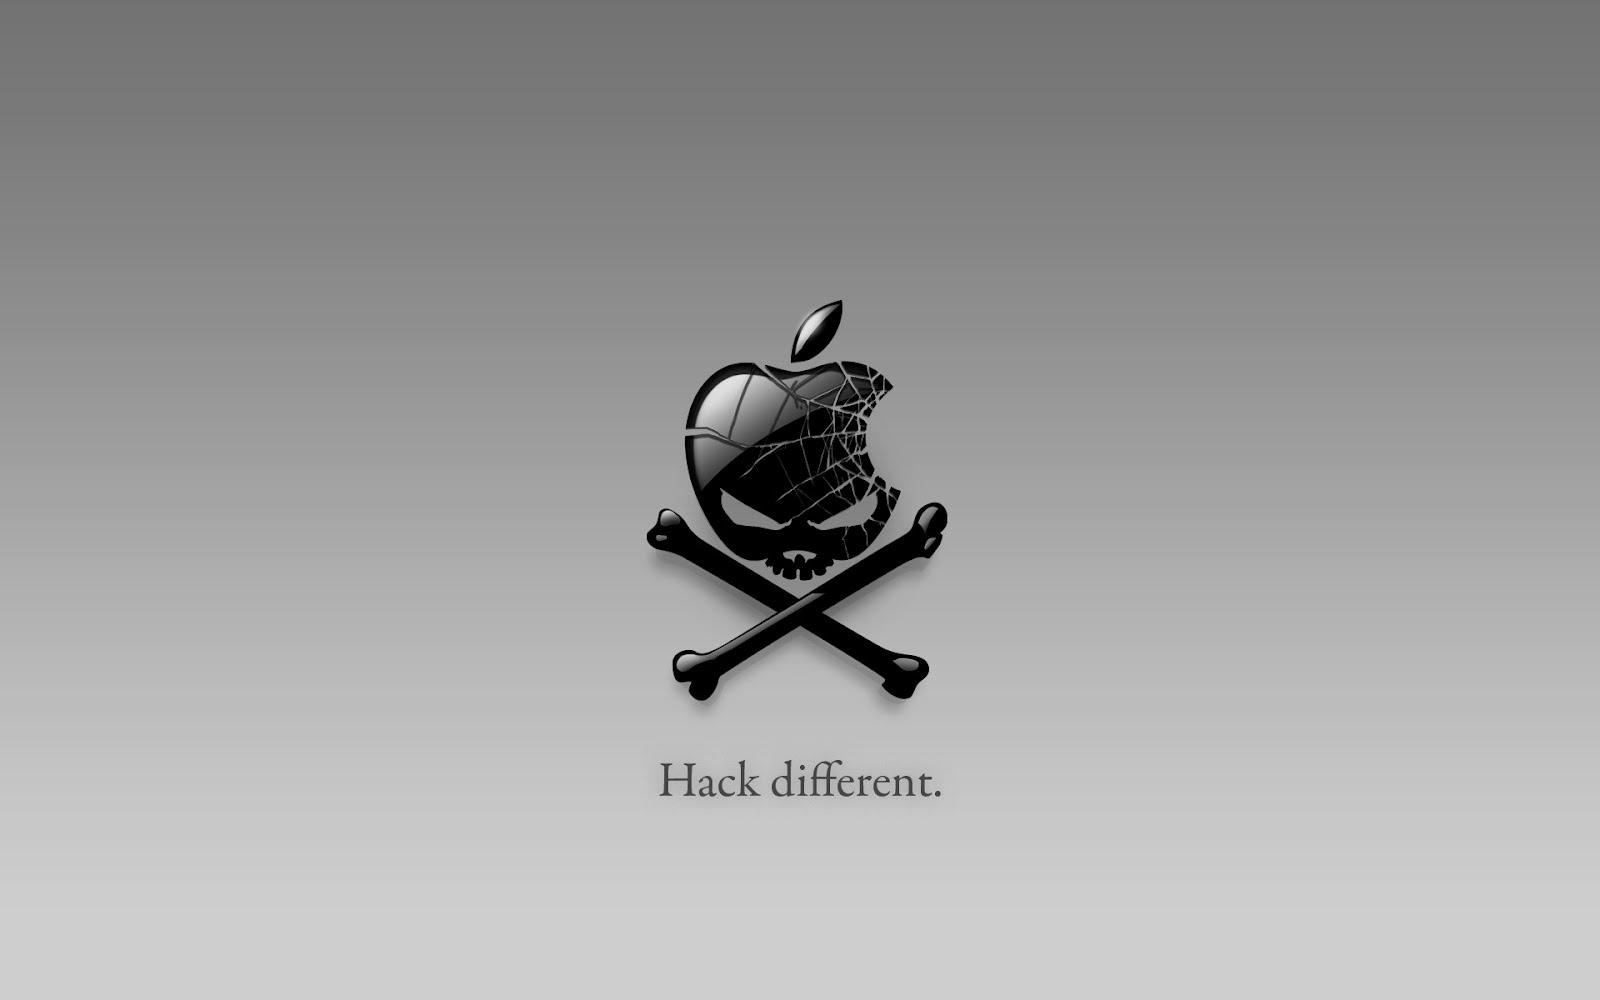 Untethered-Jailbreak-Hack-Different